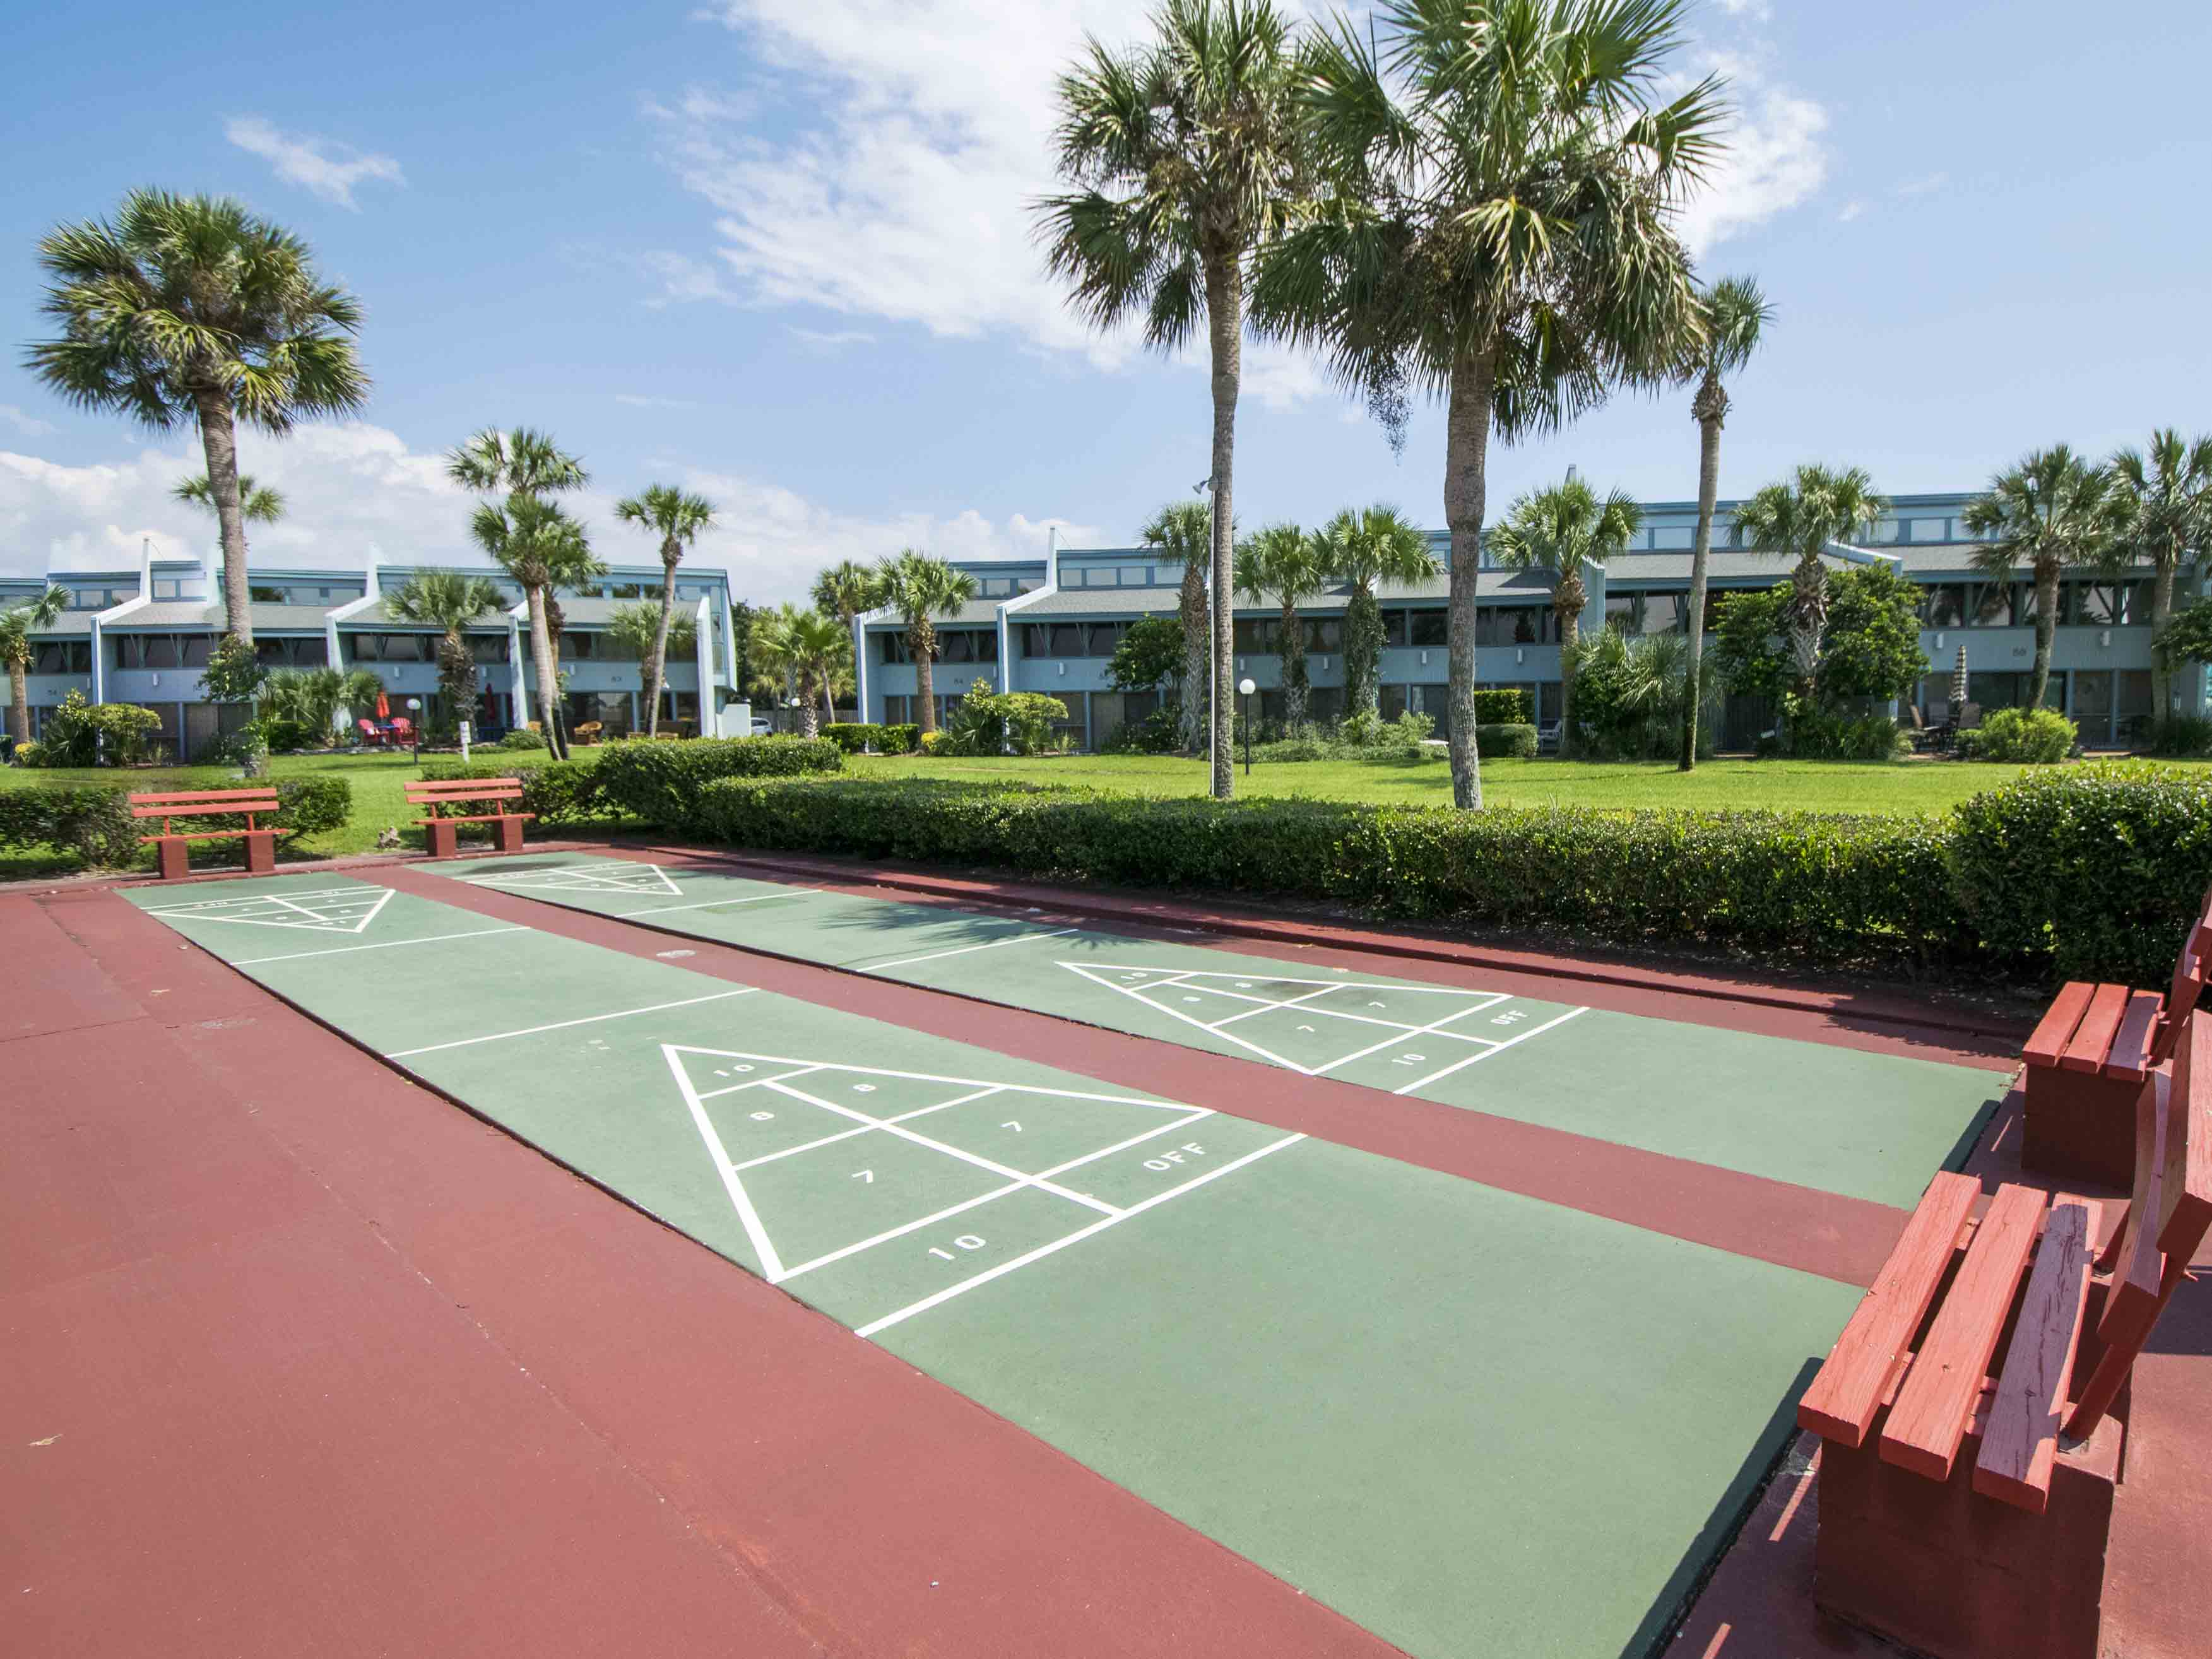 Sunnyside Beach & Tennis Resort - Panama City Beach Condo Rental